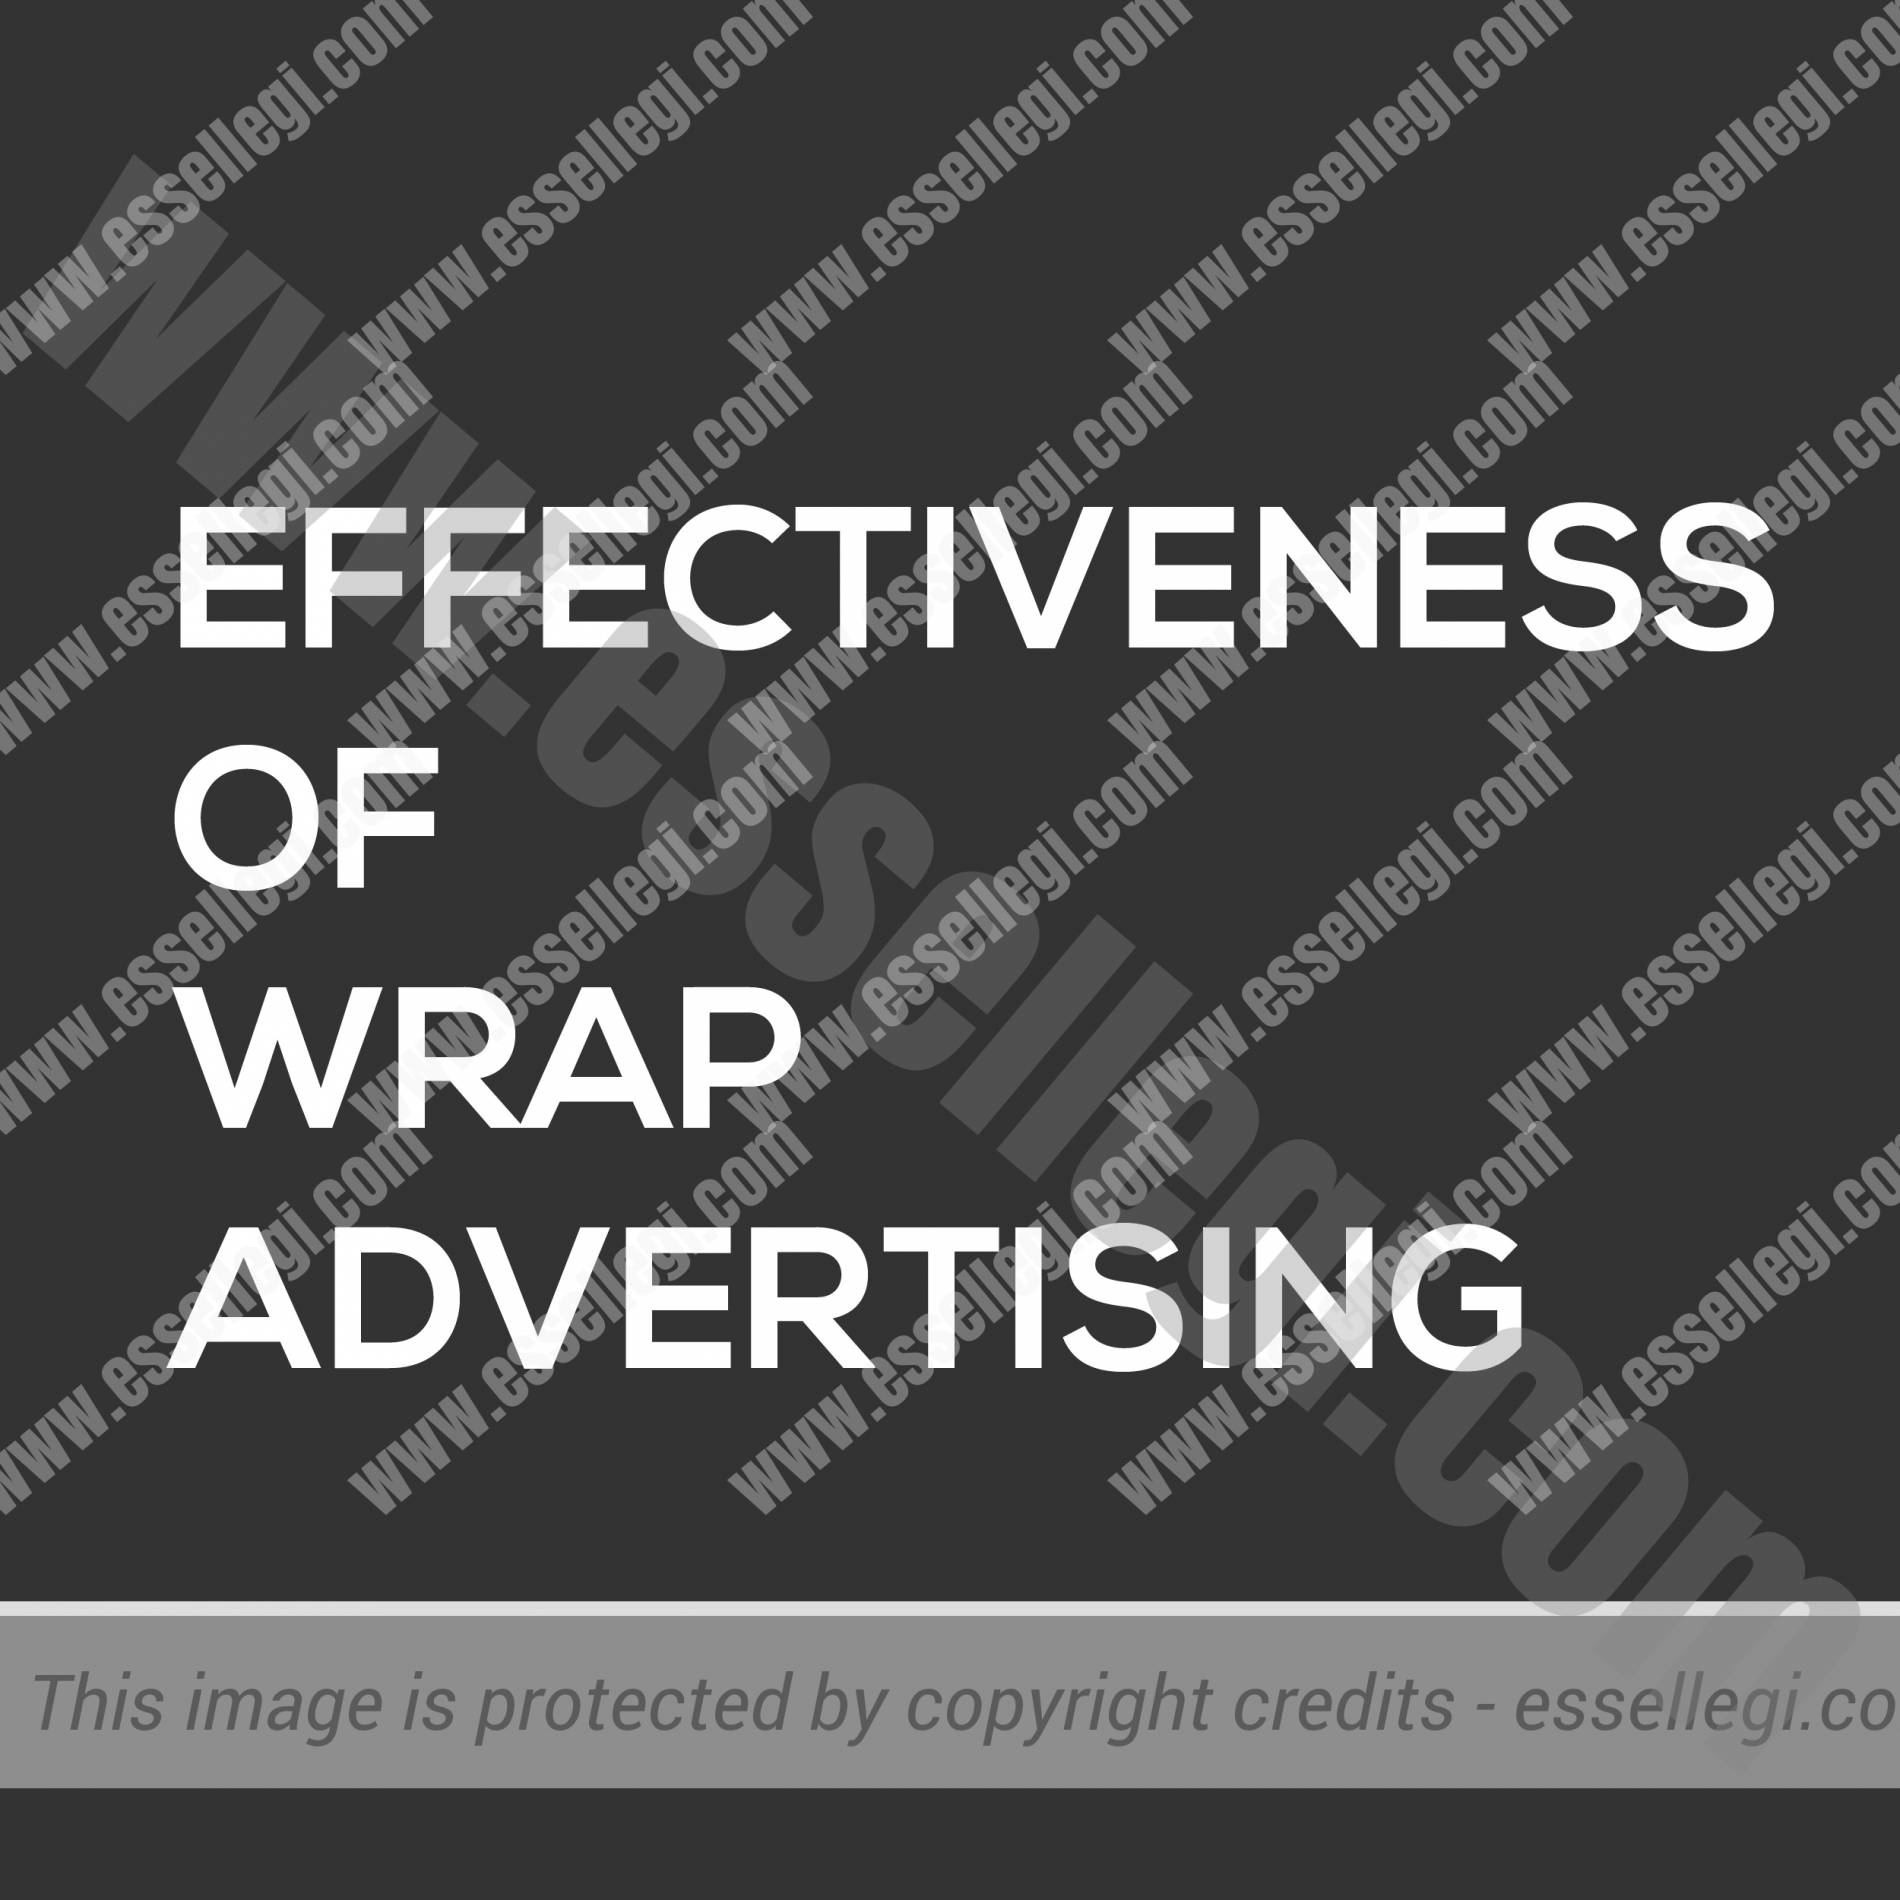 EFFECTIVENESS OF WRAP ADVERTISING